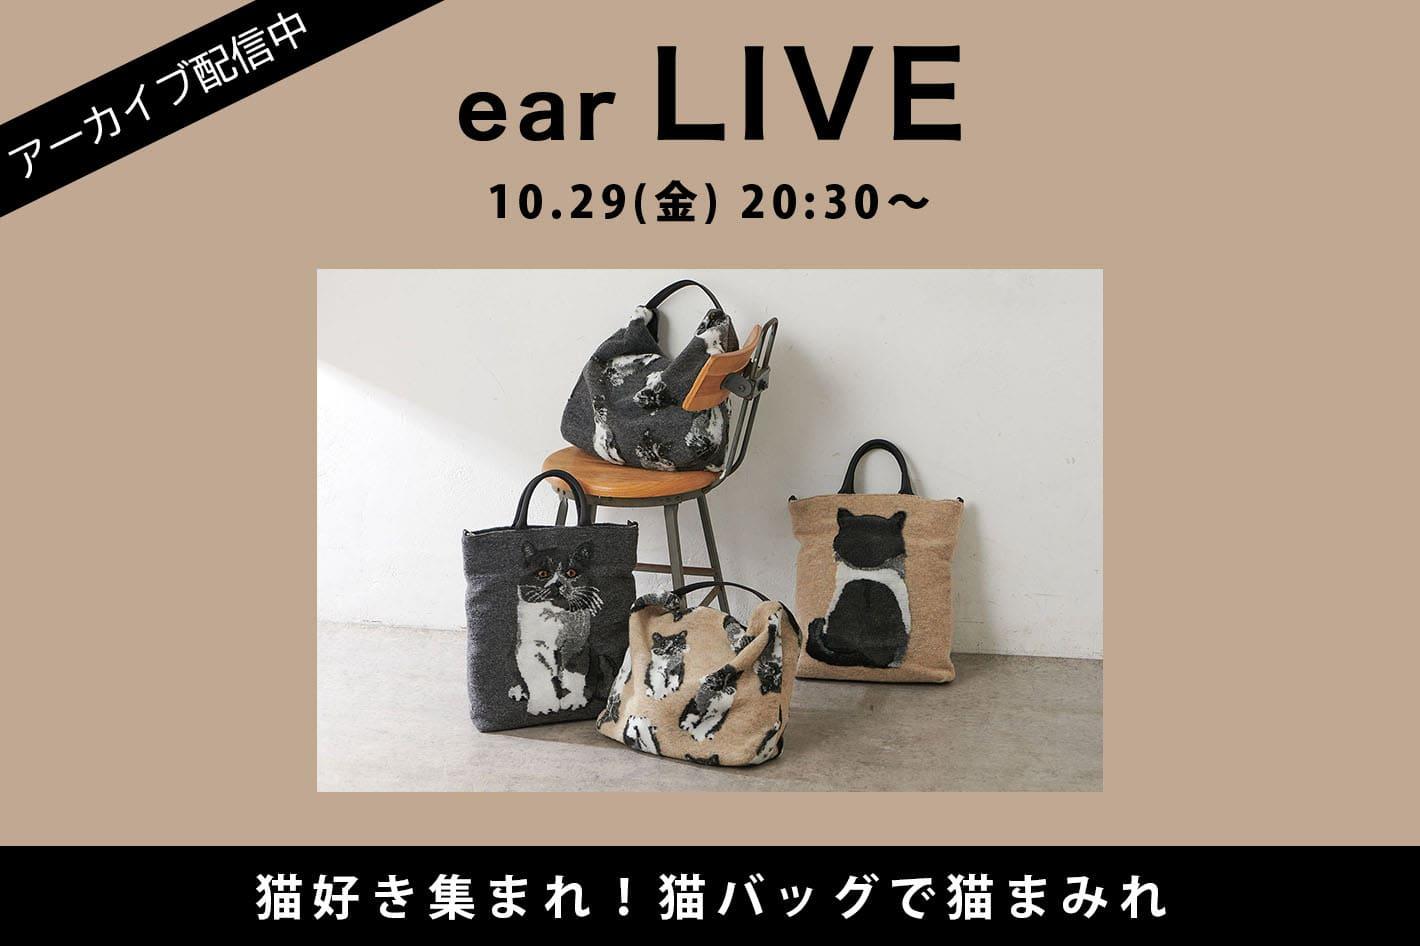 ear PAPILLONNER <ear LIVE>10/29 20:30~猫好き集まれ!猫バッグで猫まみれ♬